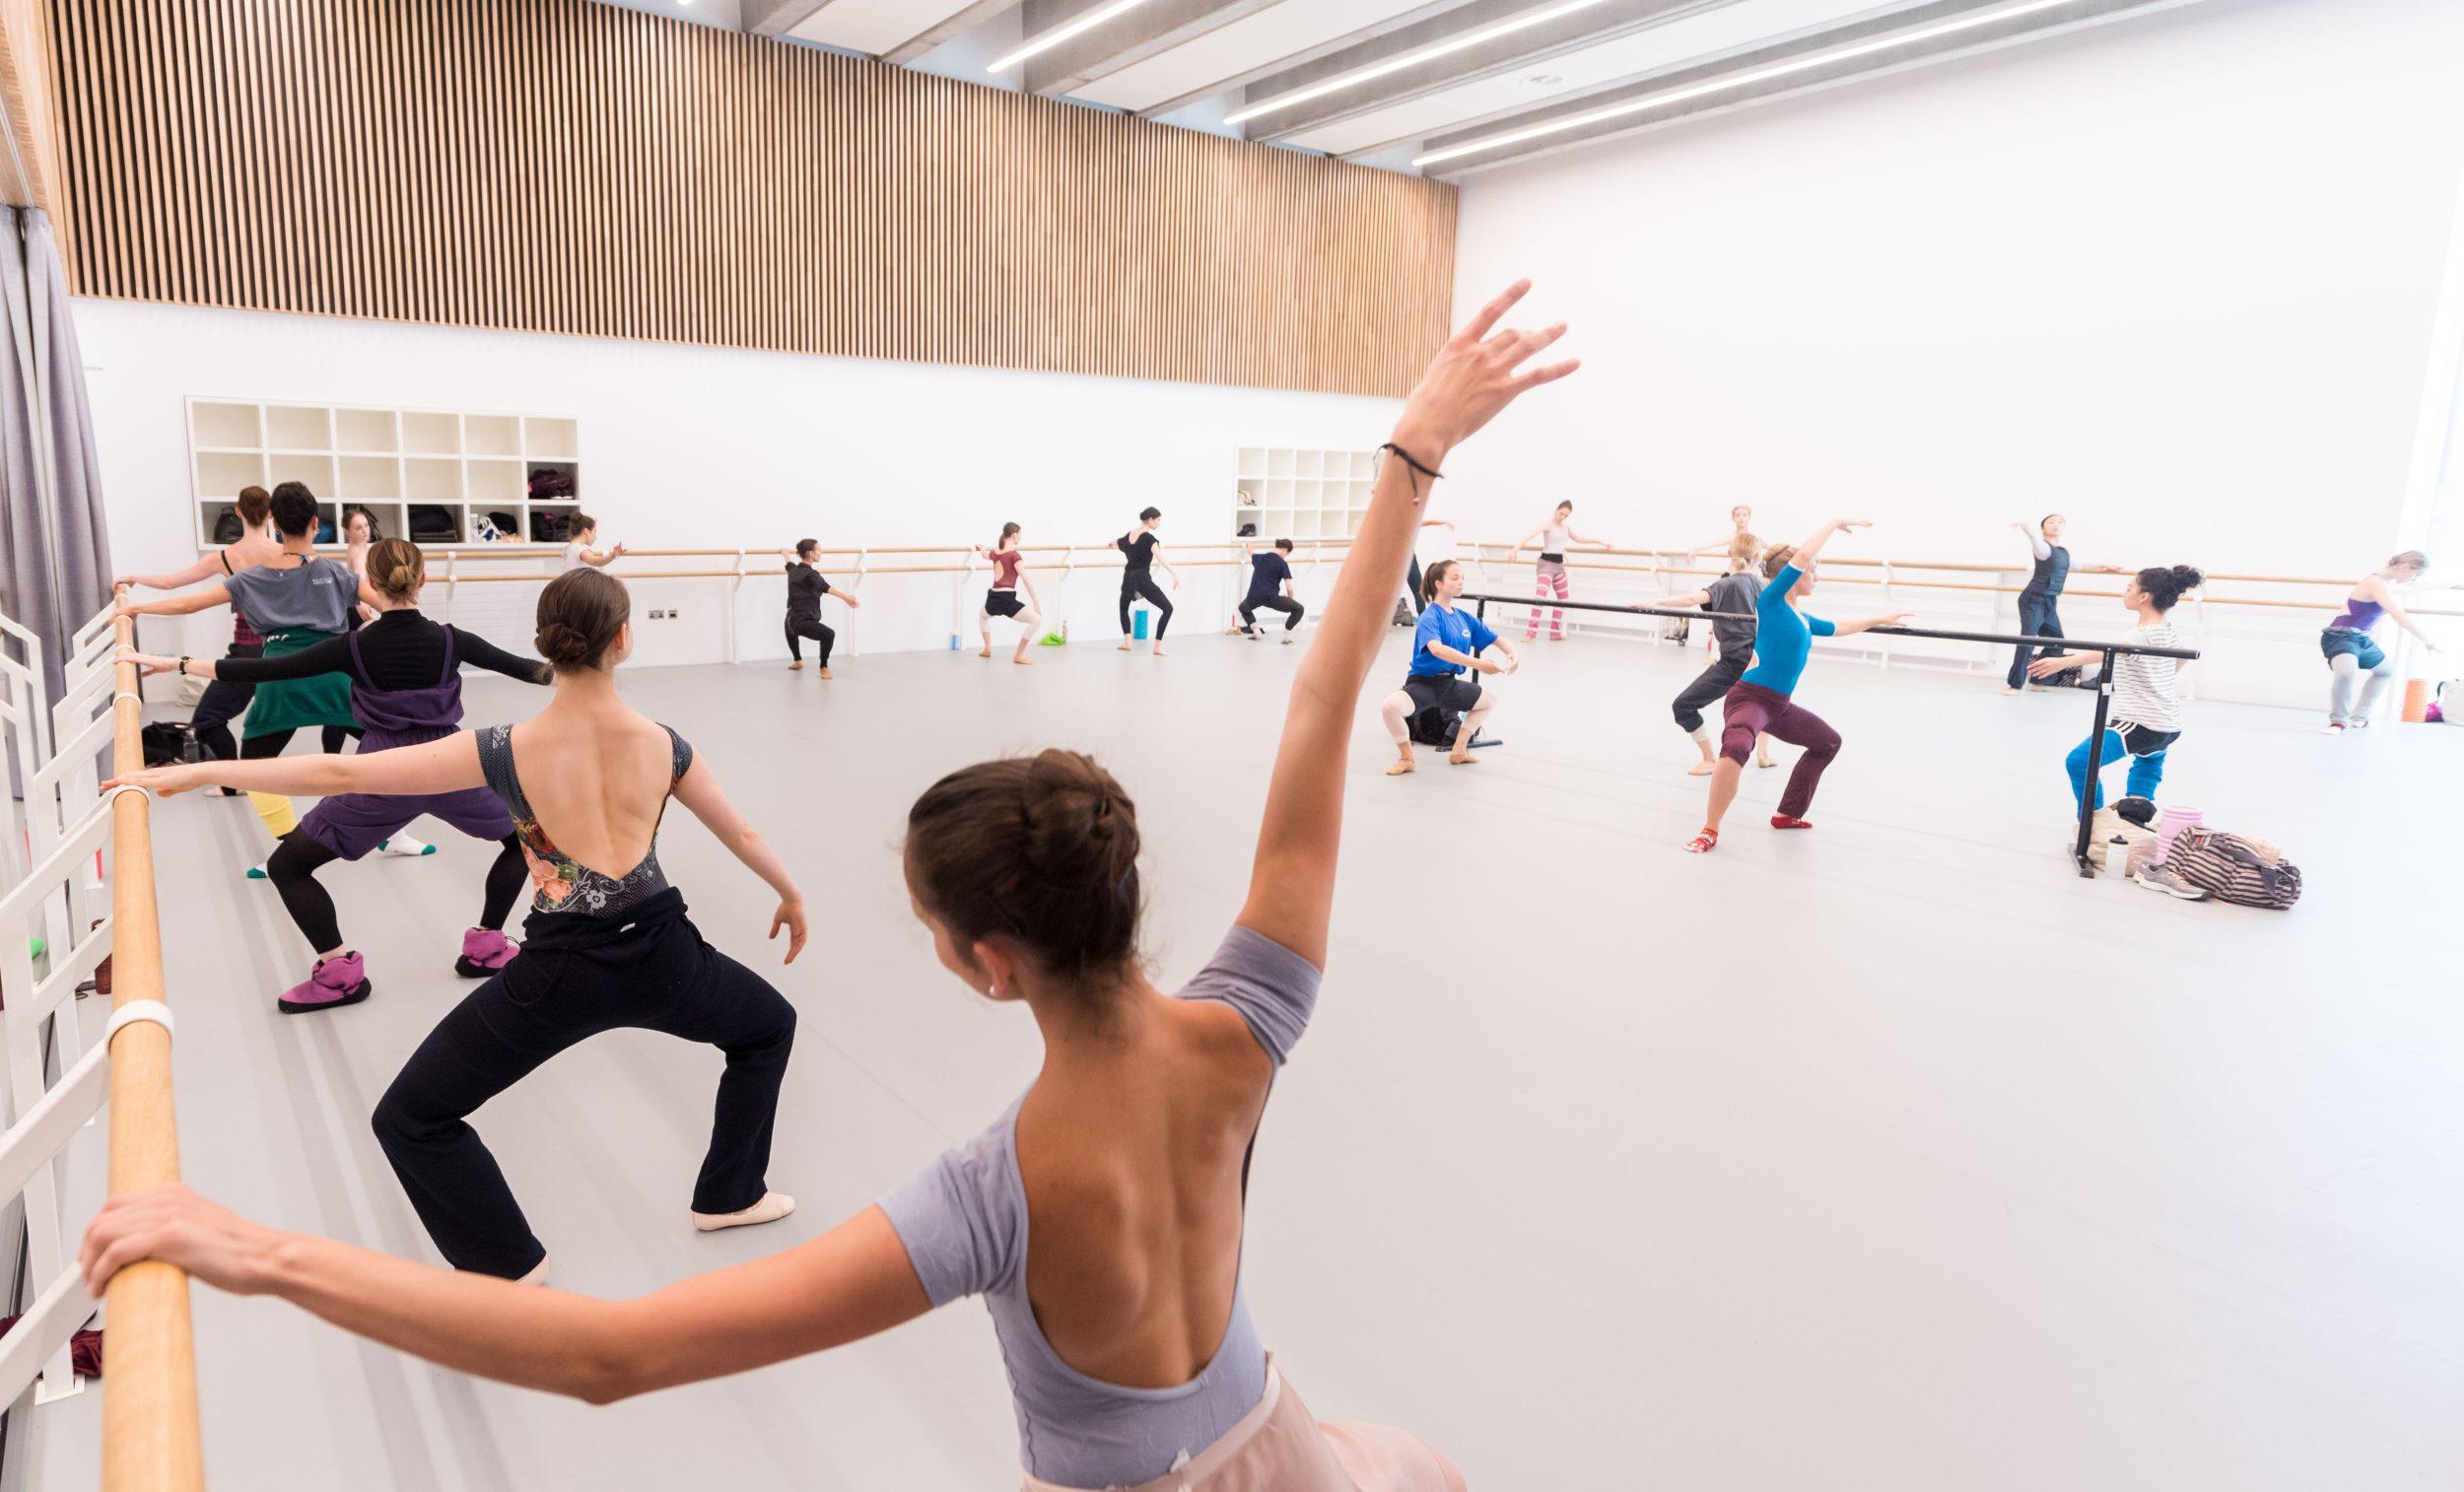 PRESS English National Ballet's new home on London City Island - rehearsal studio - (C) Ian Gavan